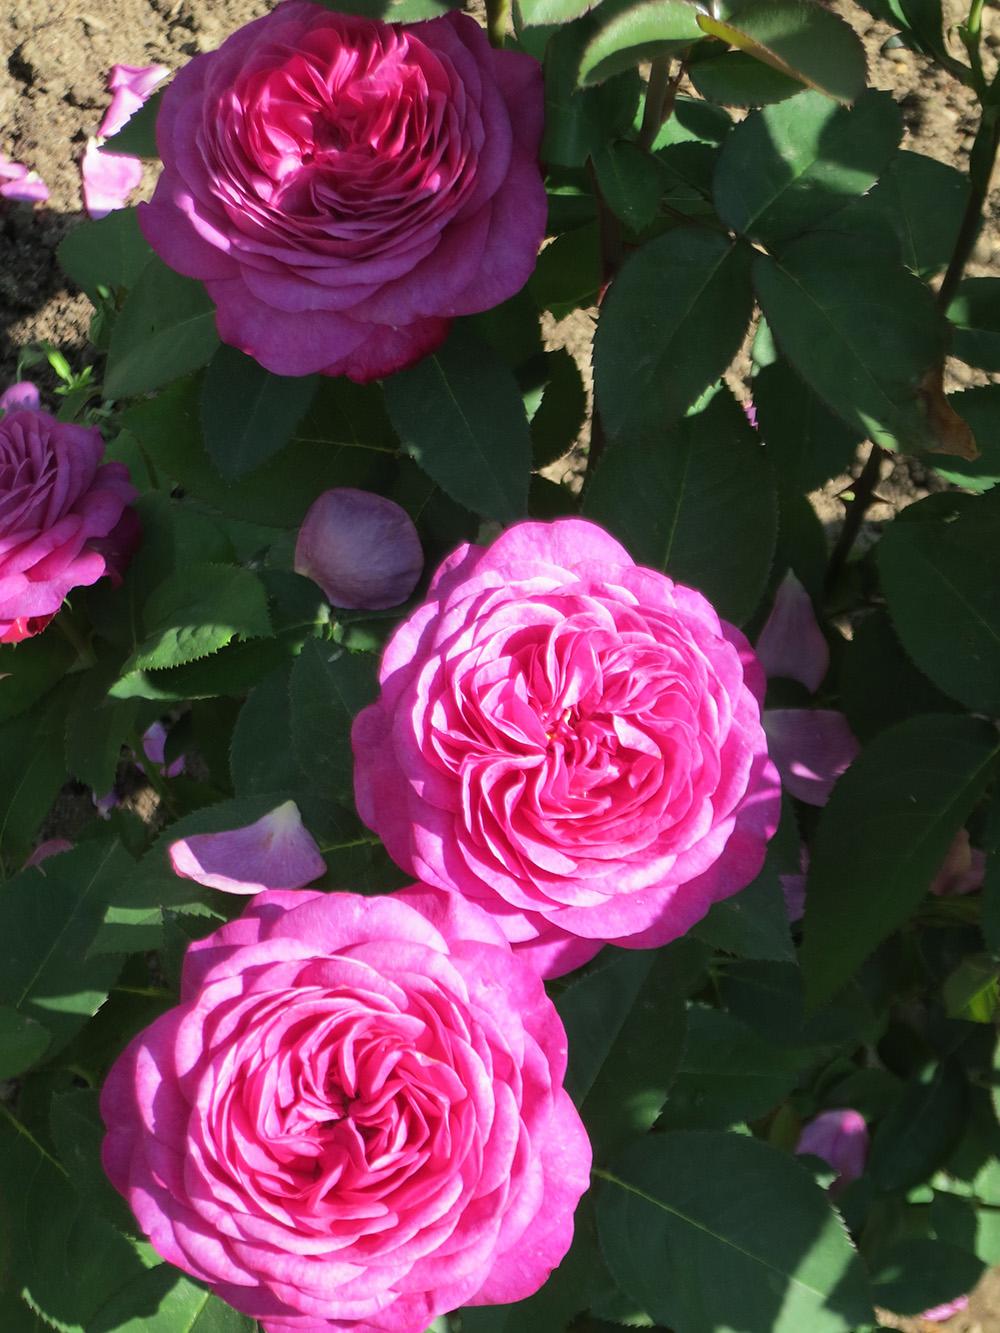 Фото Розовая роза, украшенная белыми цветками